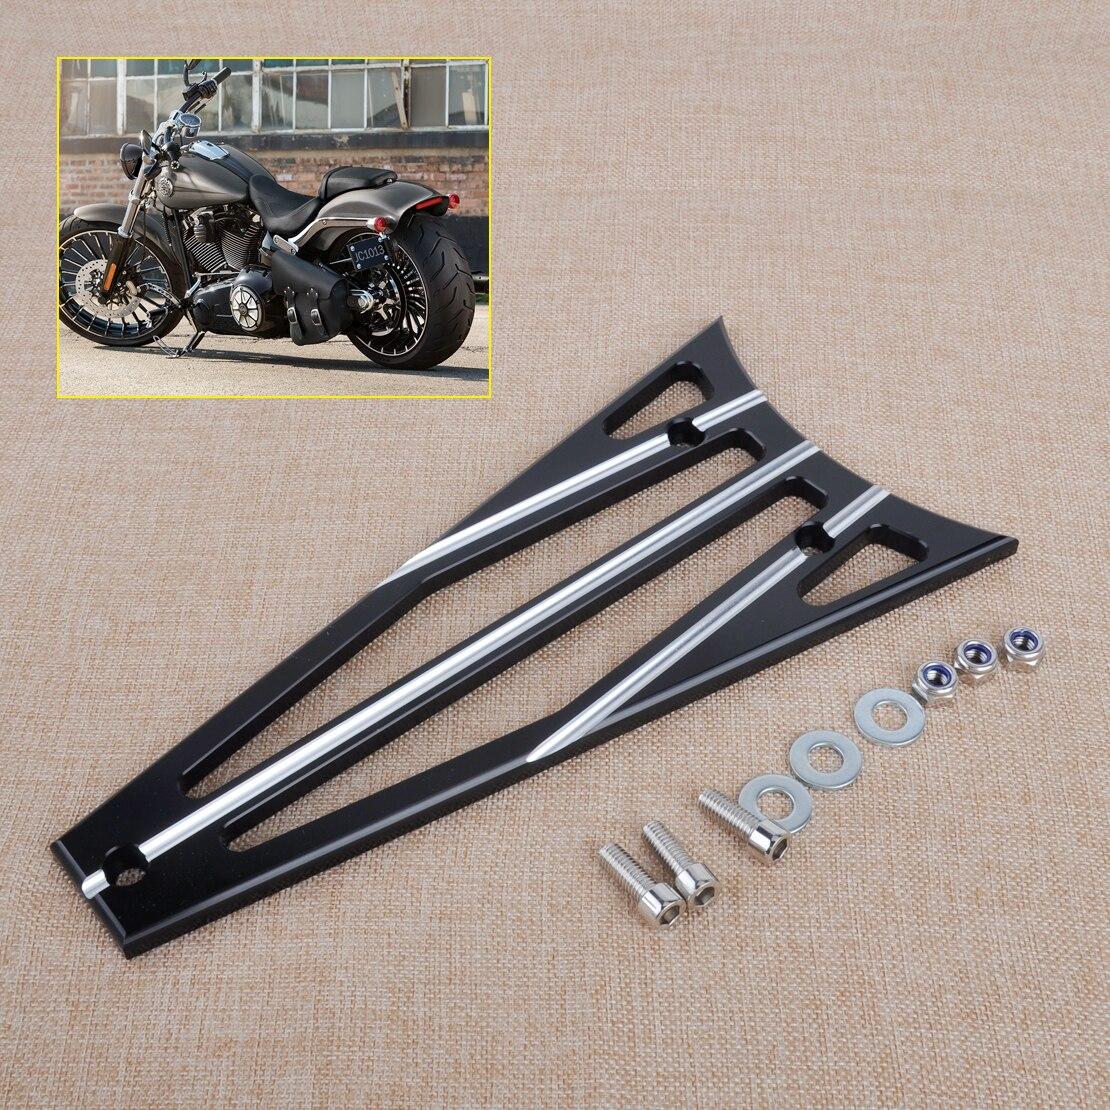 CITALL 3 Columns Billet Deep Cut Frame Grill For Harley Electra Glide/Road King/Road Glide/Street Glide 2009 2010 2011 2012 2013<br>